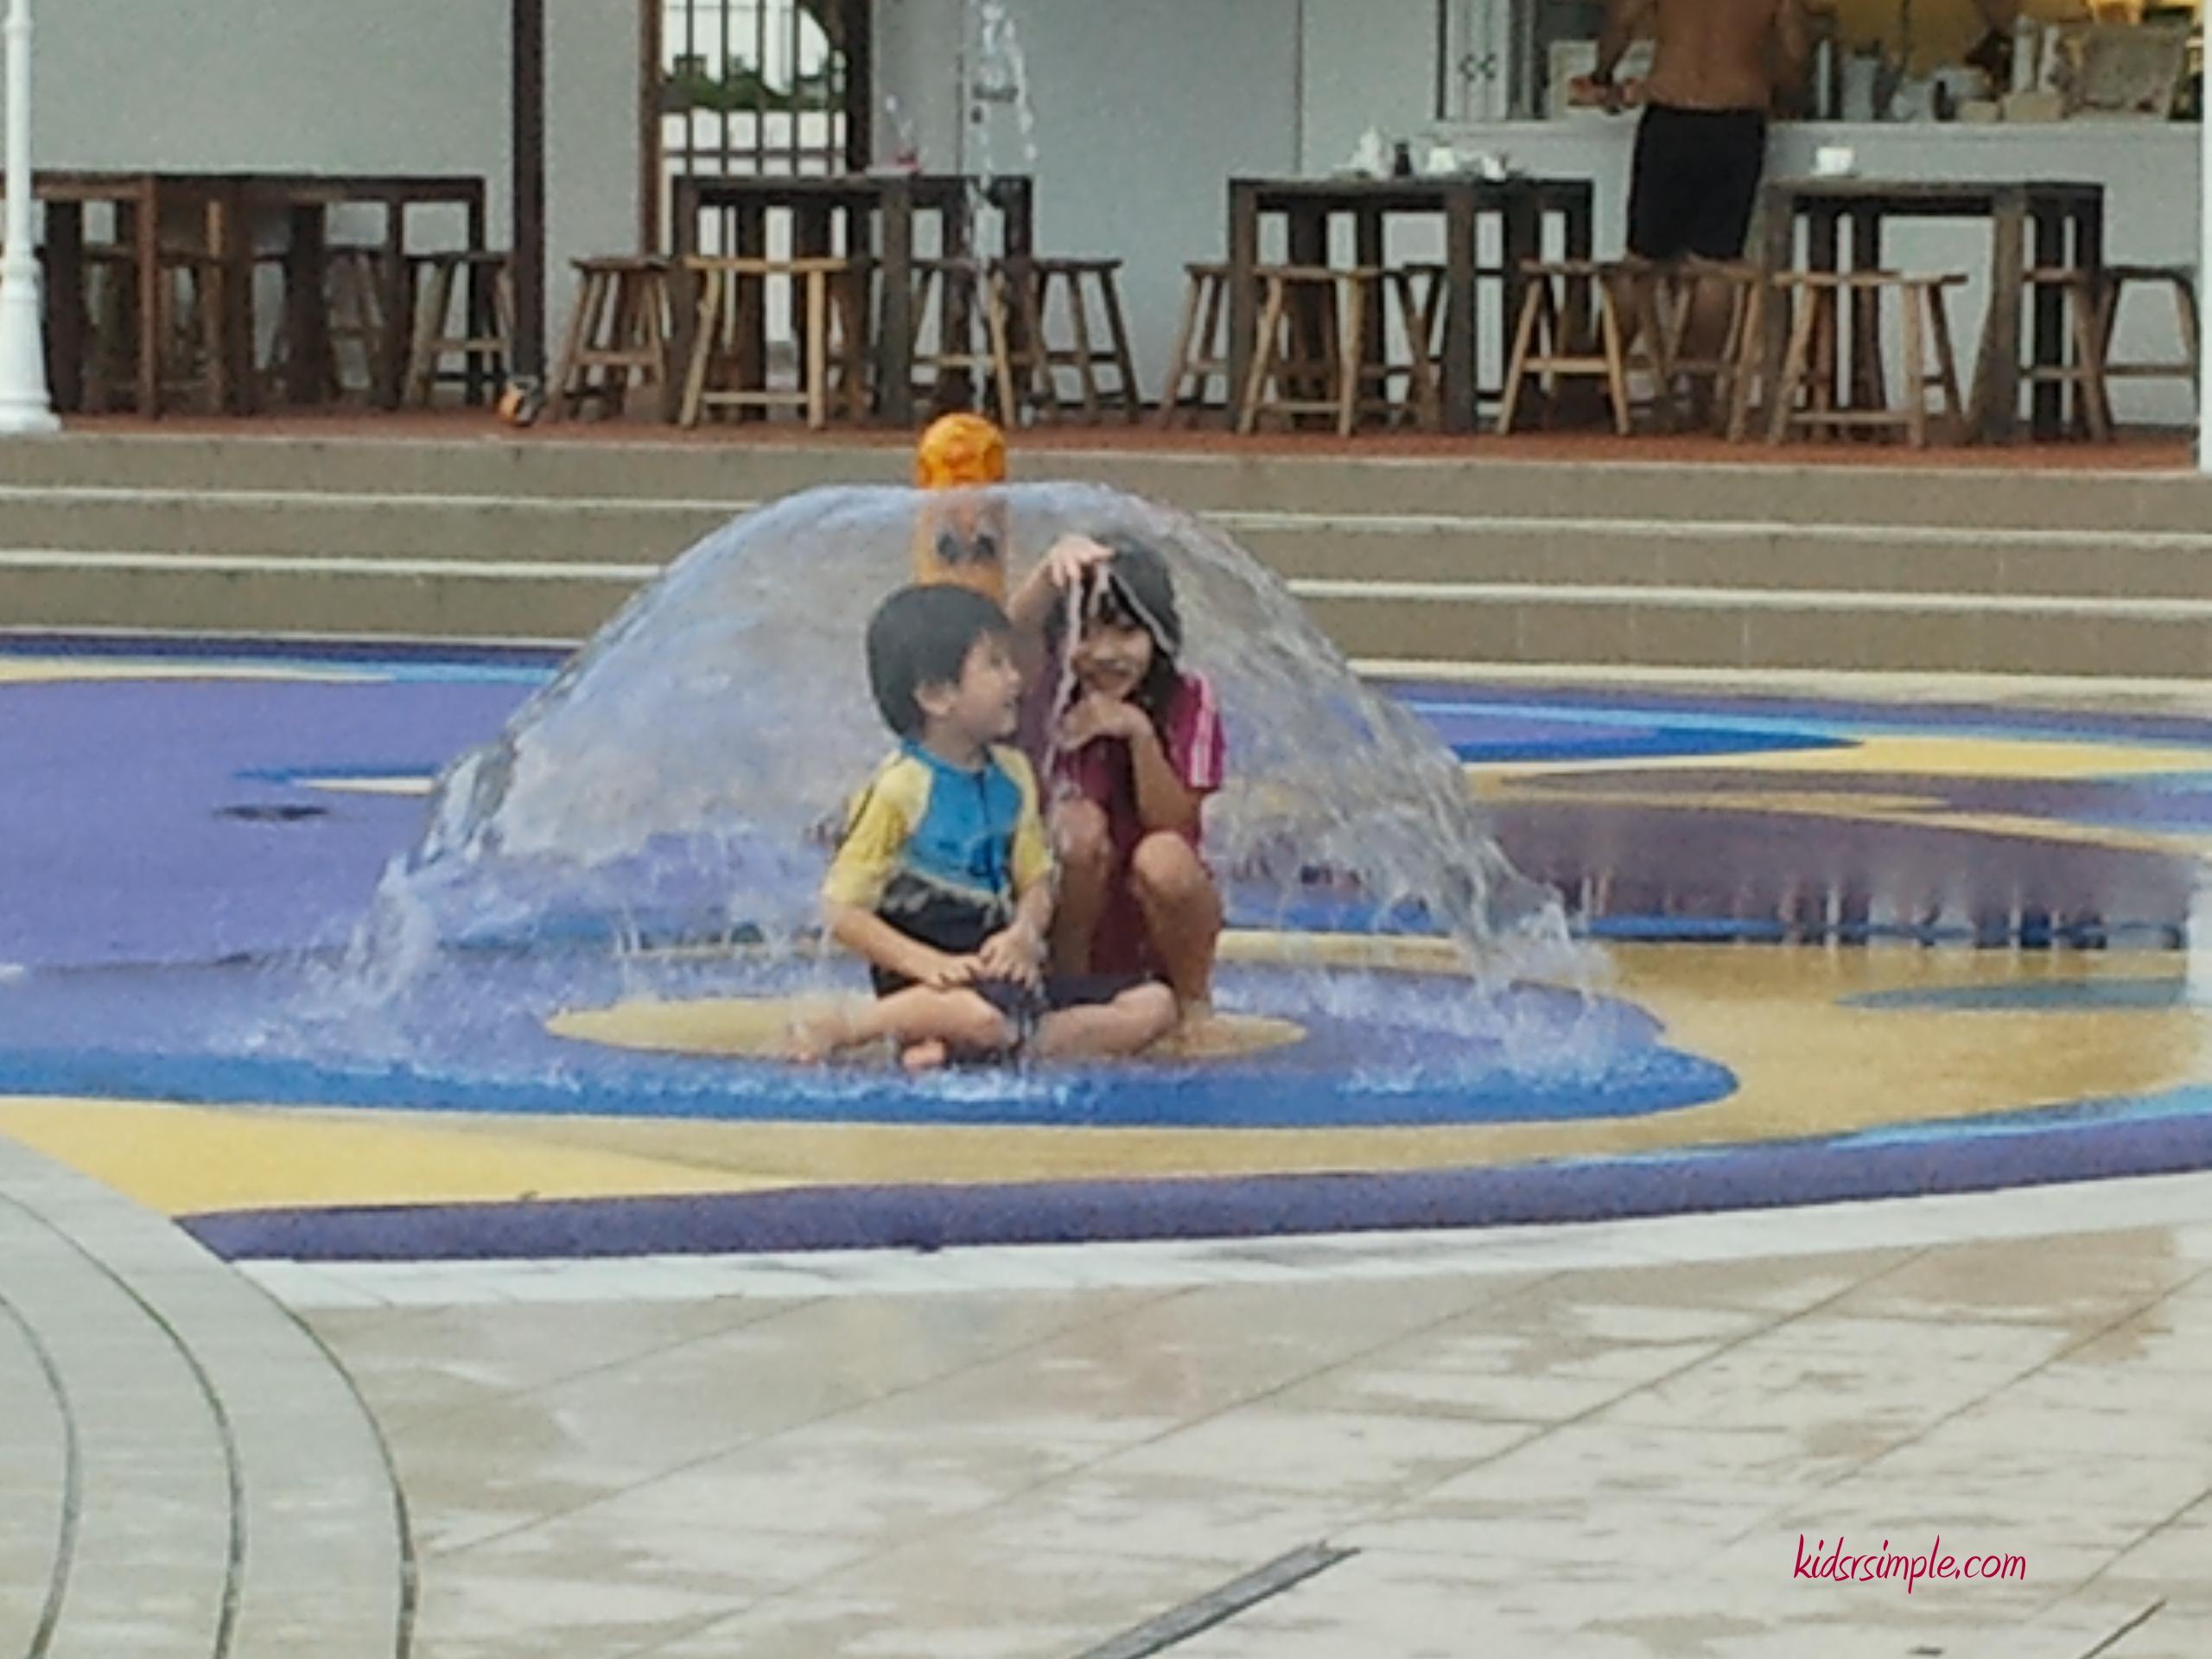 10 Fun Outdoor Activities For The Kids 2013 Kids 39 R 39 Simple